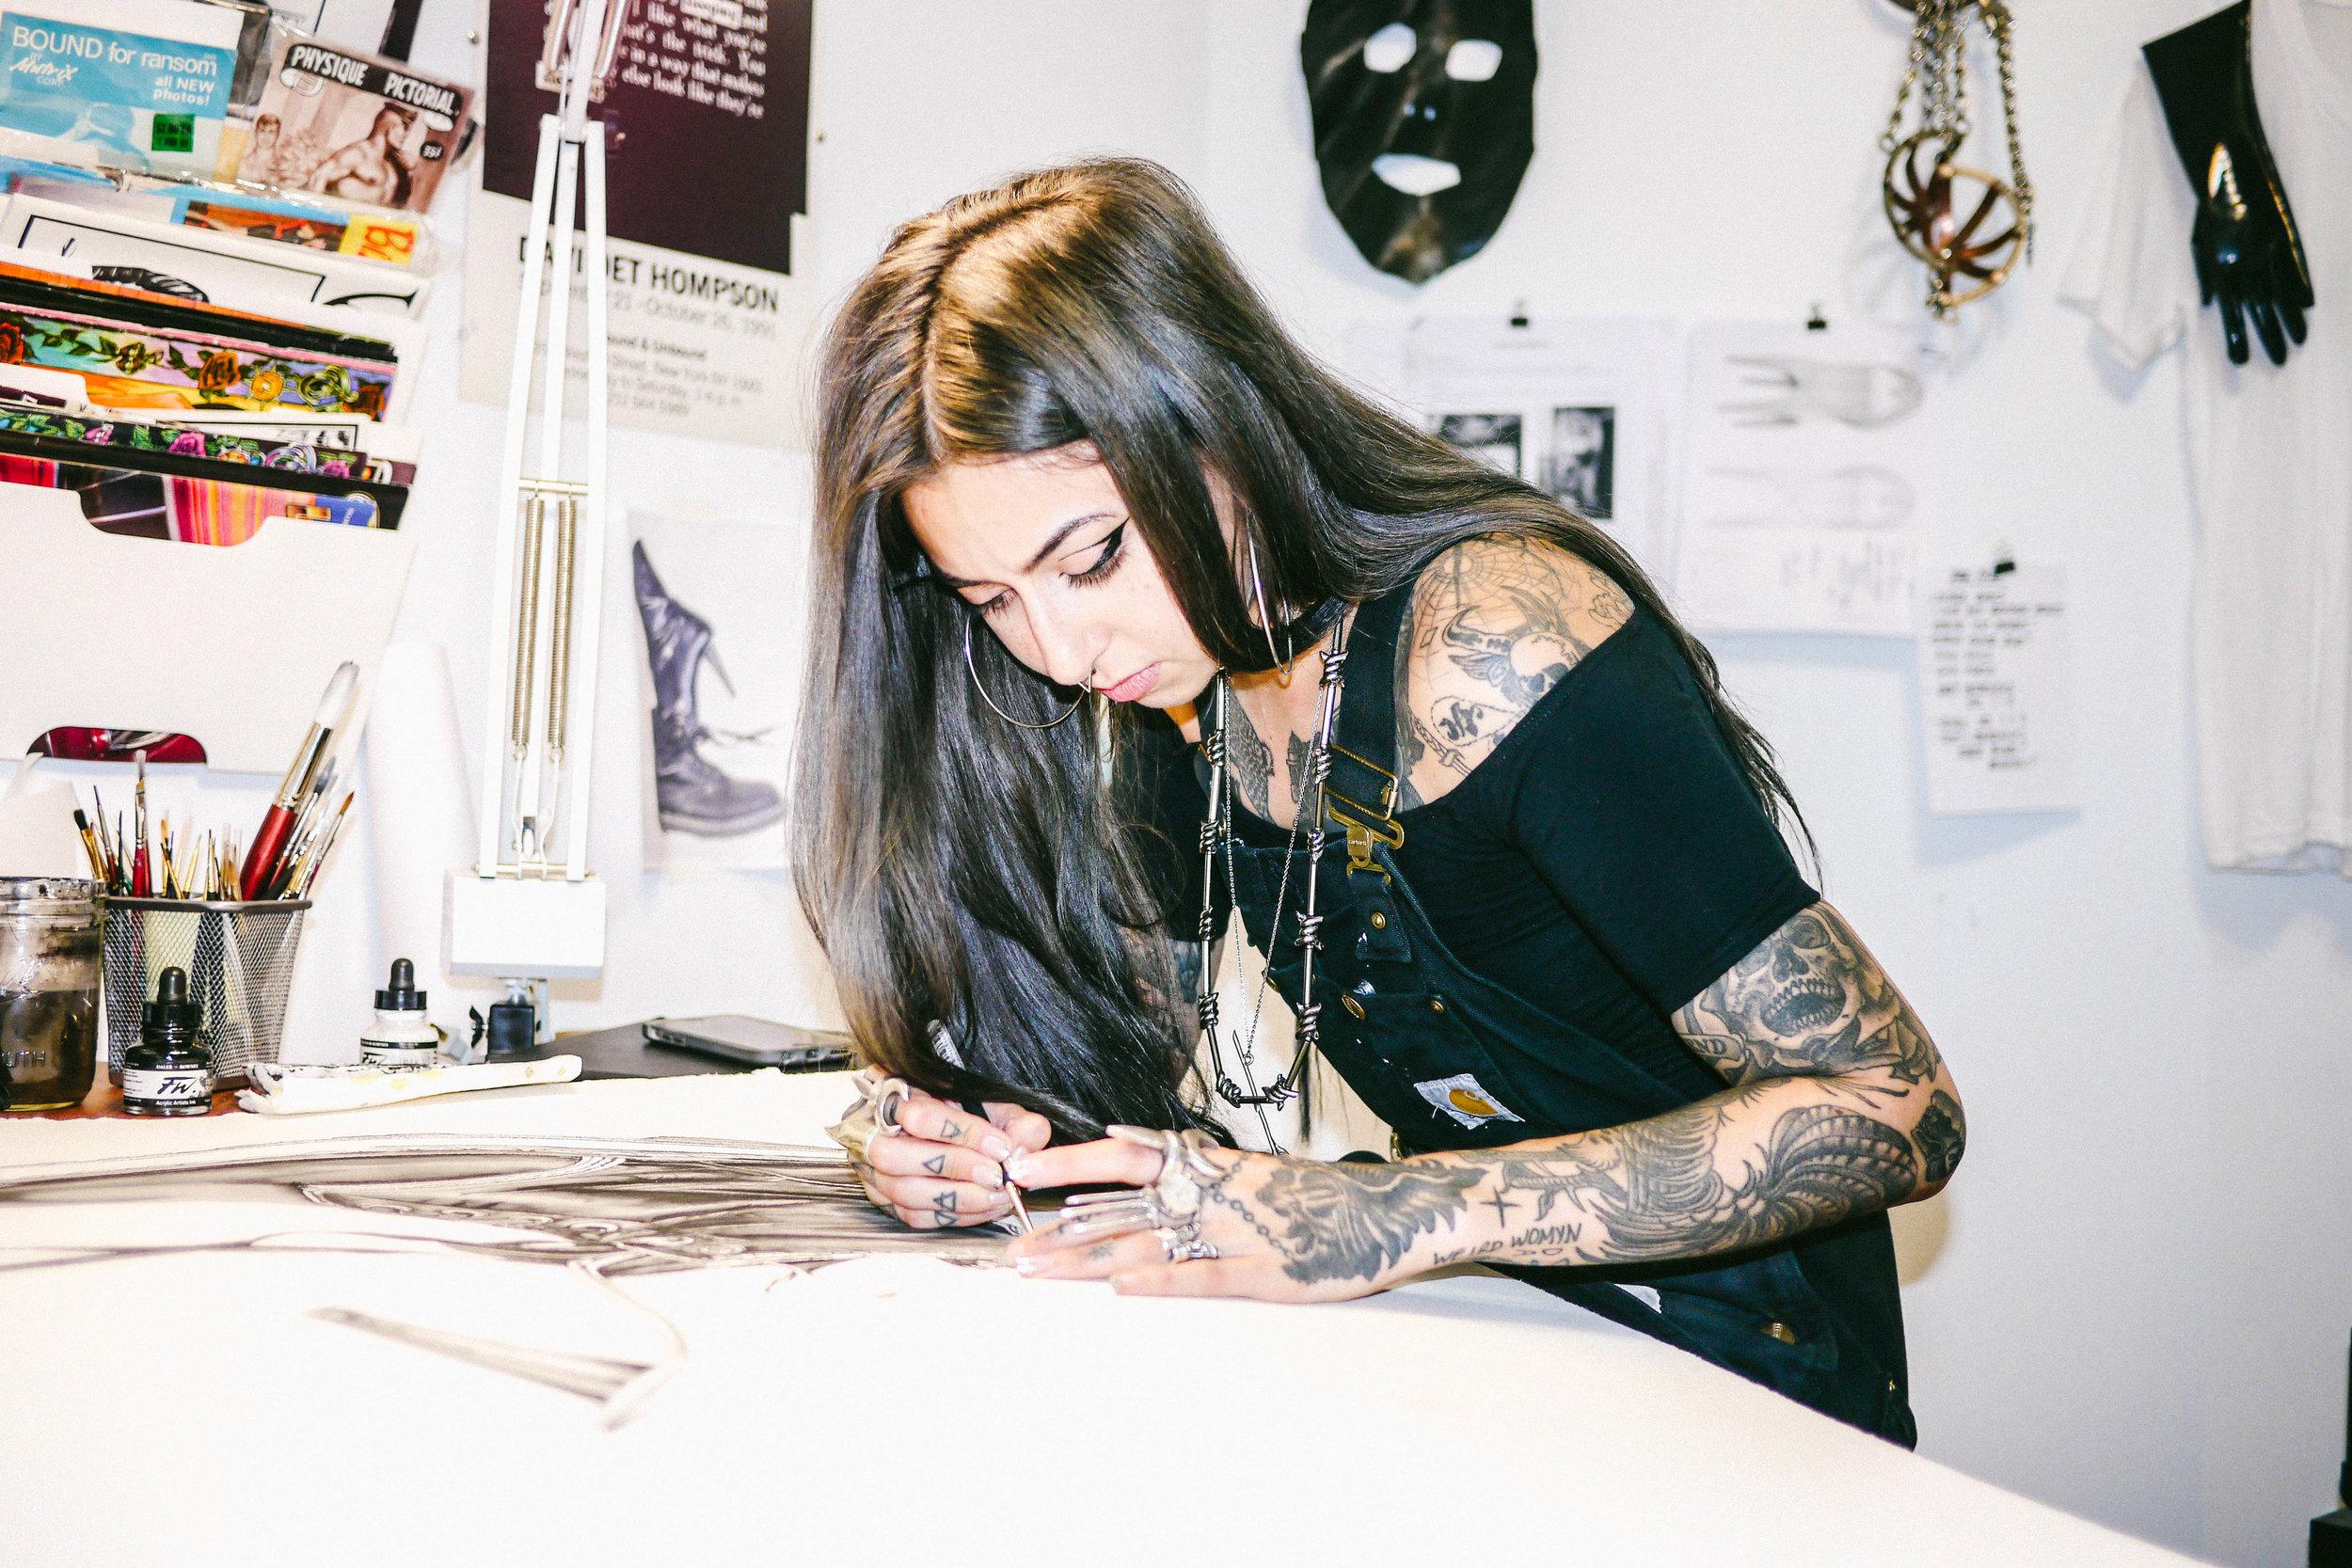 tamara santibanez best tatoo shops in new york city.jpg